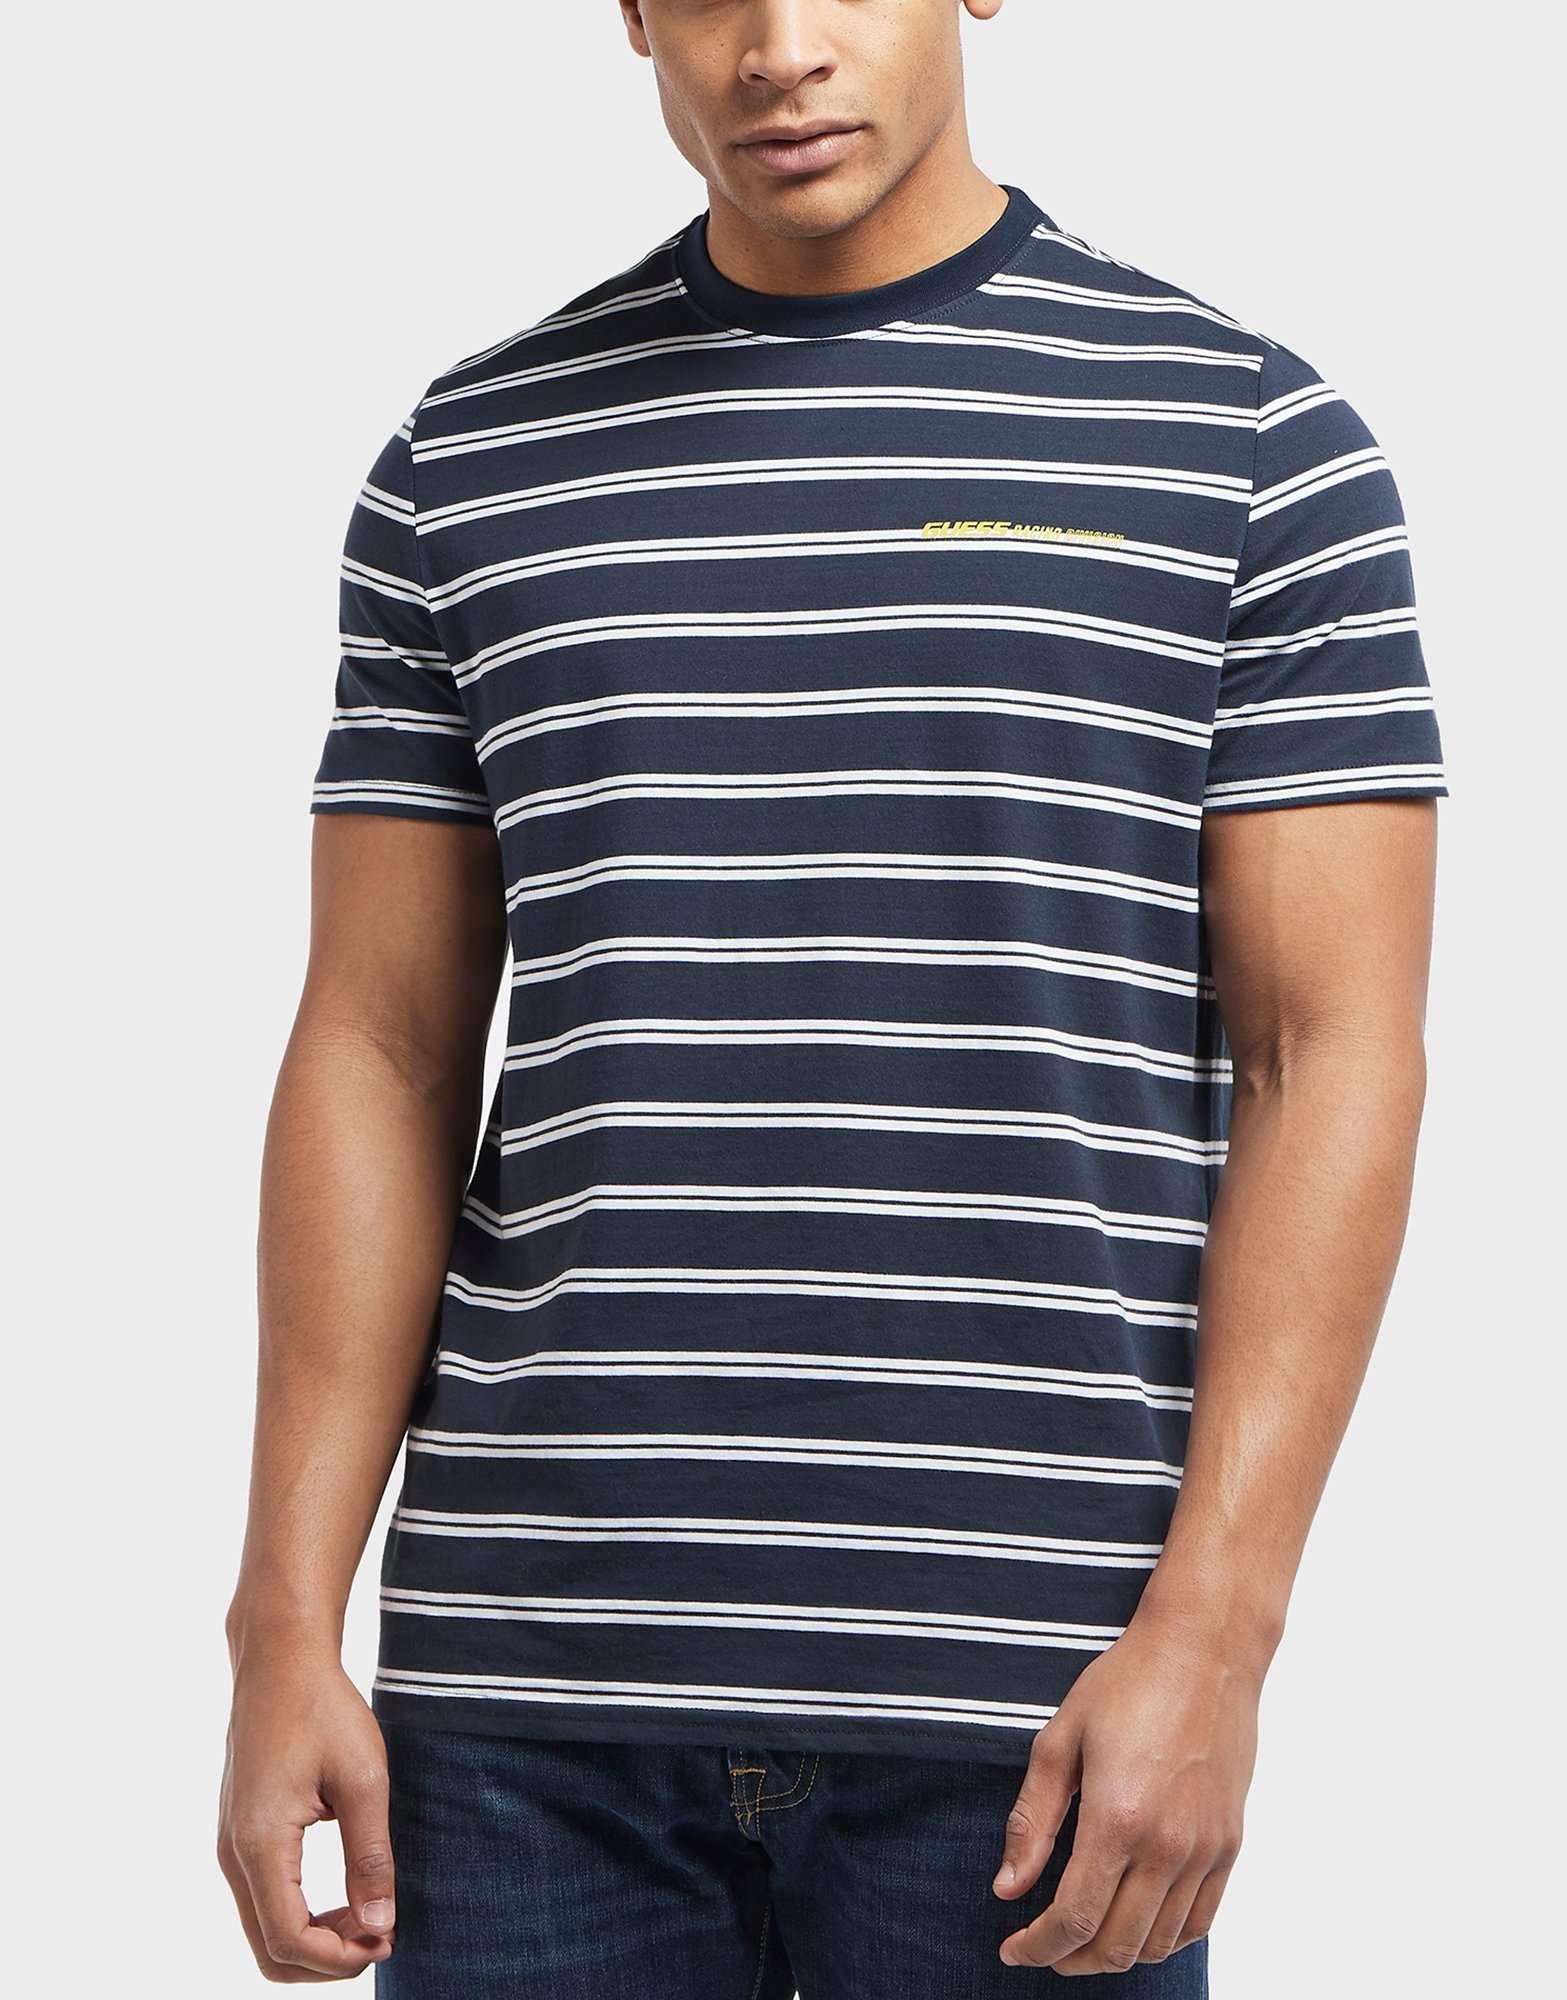 Guess Stripe Short Sleeve T-Shirt - Online Exclusive